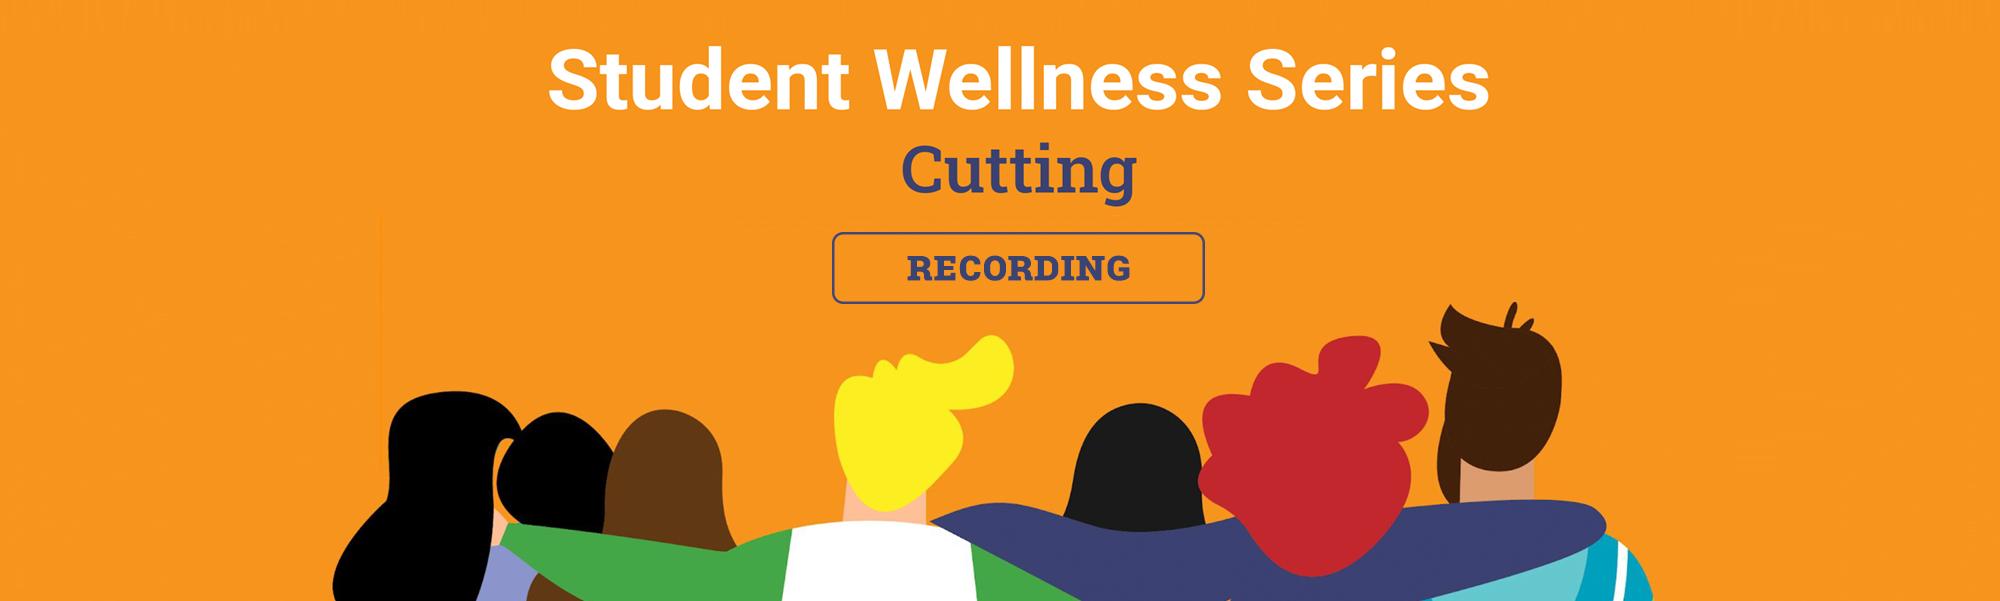 Student Wellness Series: Cutting